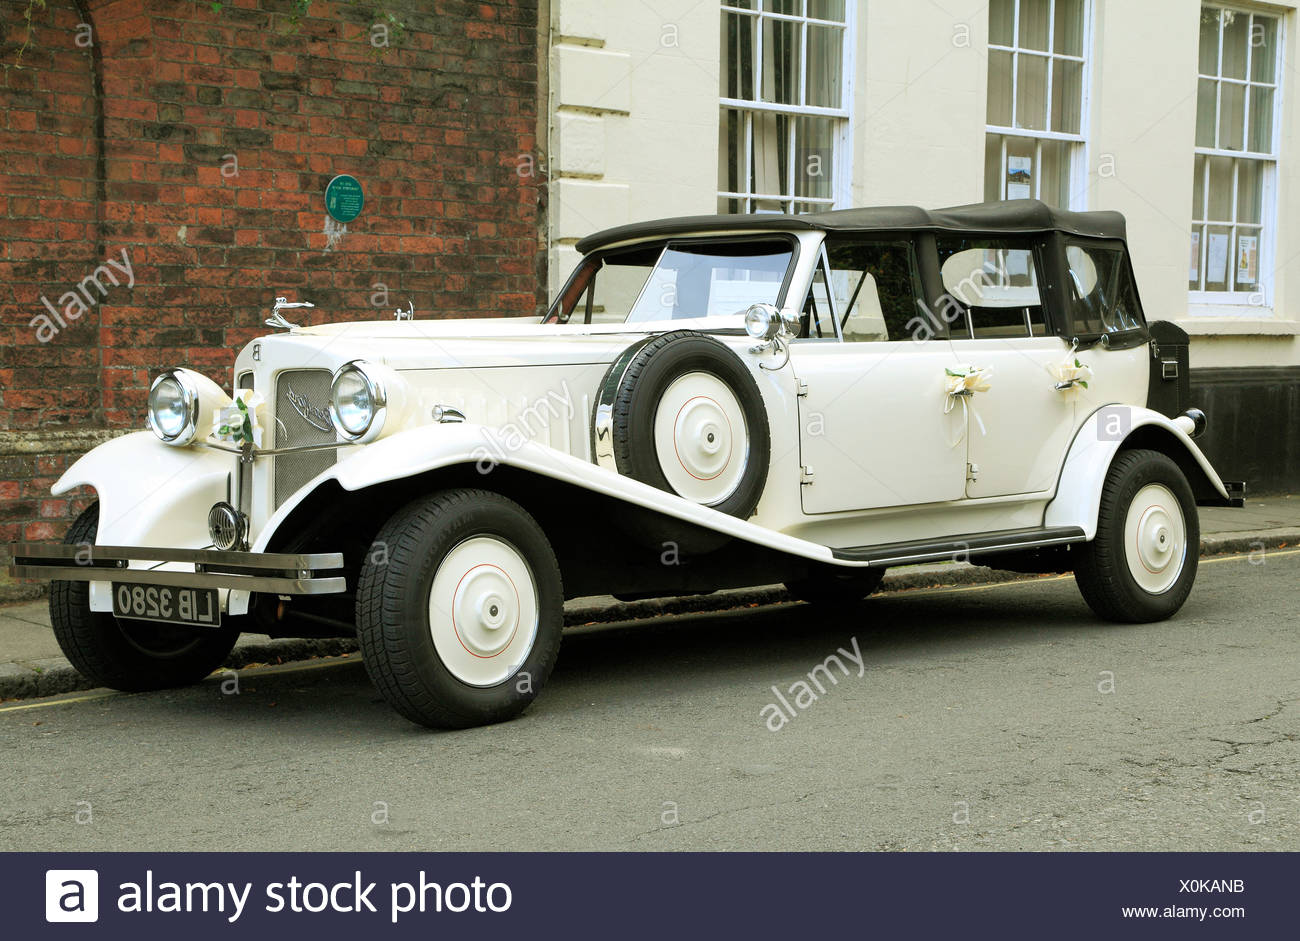 Vintage boda coche nupcial, Beauford automóviles automóviles automóviles Imagen De Stock